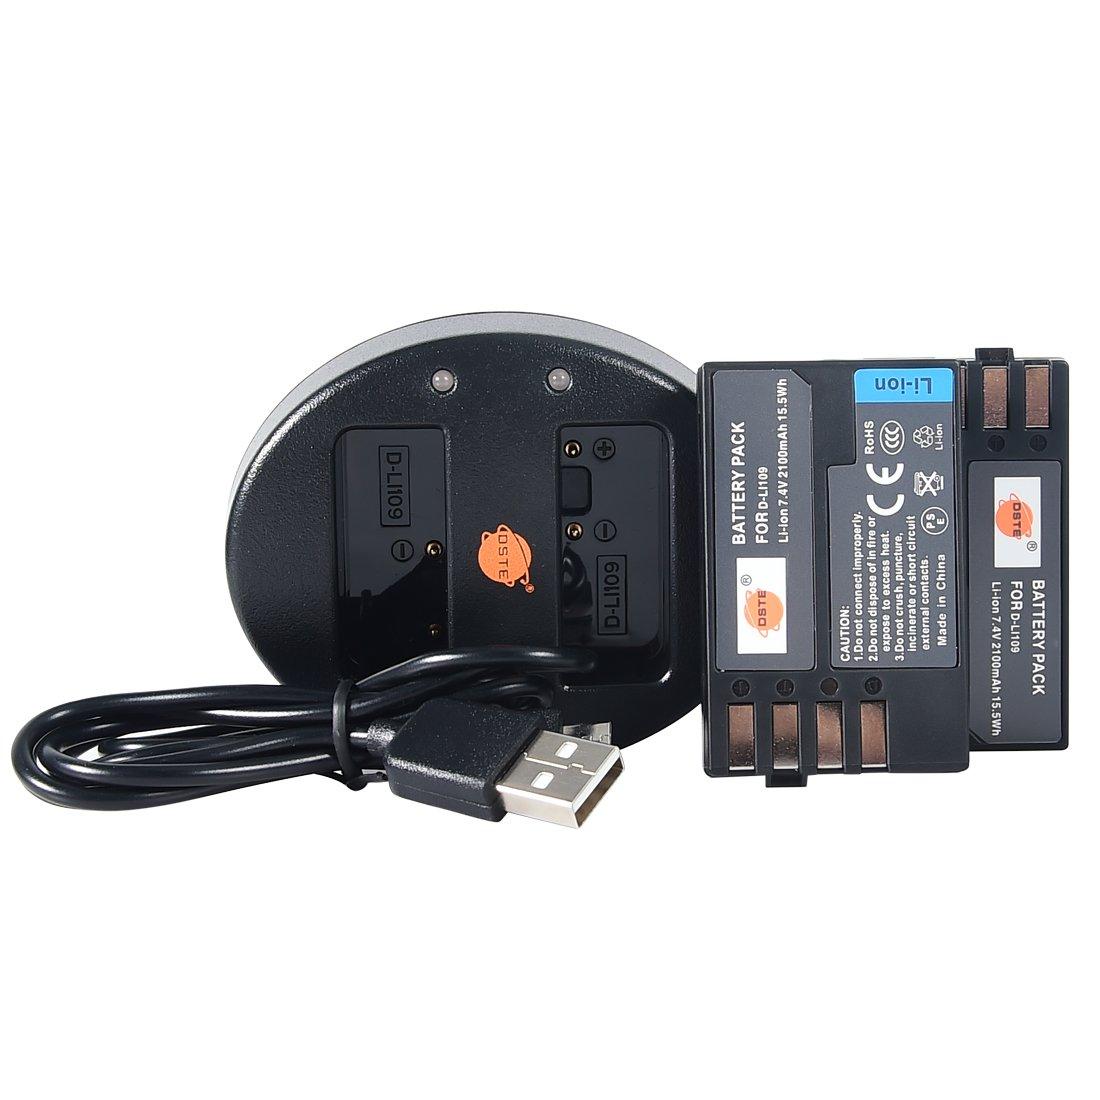 DSTE 2 x d-li109バッテリー+デュアルUSB充電器for Pentax k2 K - 50 K - 30 K - r k-500 K - s2 ks1デジタルカメラ B06ZYX59PQ